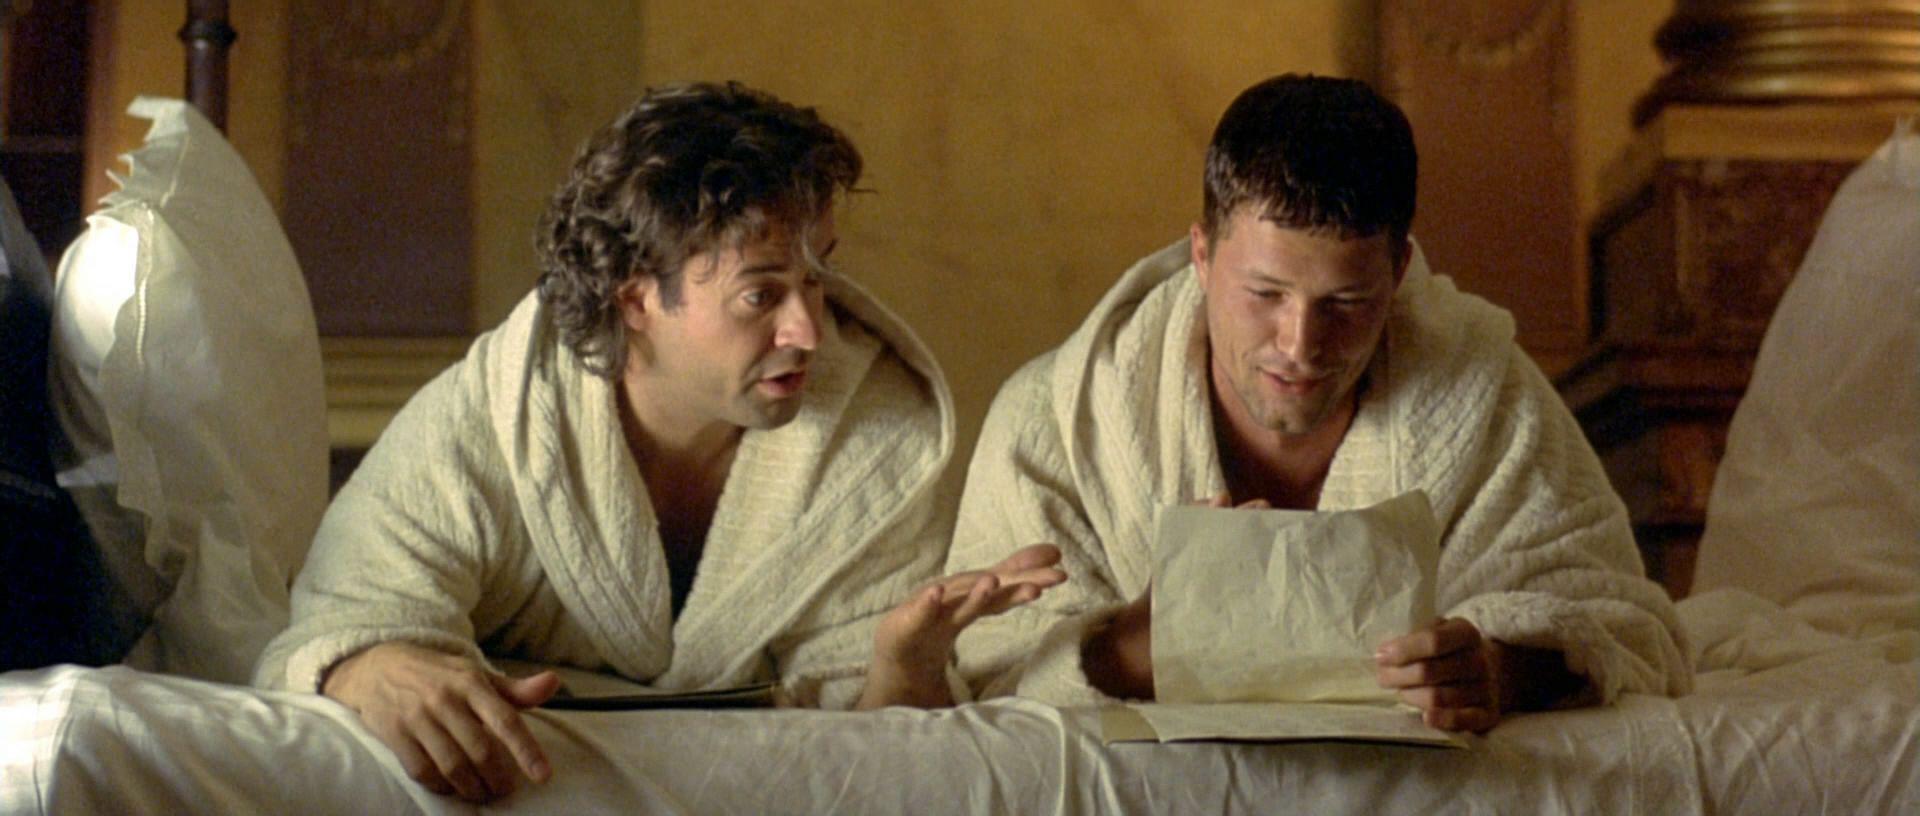 Knockin on 4 - Μία λίστα με απίστευτα συγκινητικές ταινίες που κάνουν ακόμη και τους πιο σκληρούς να ...κλαίνε!